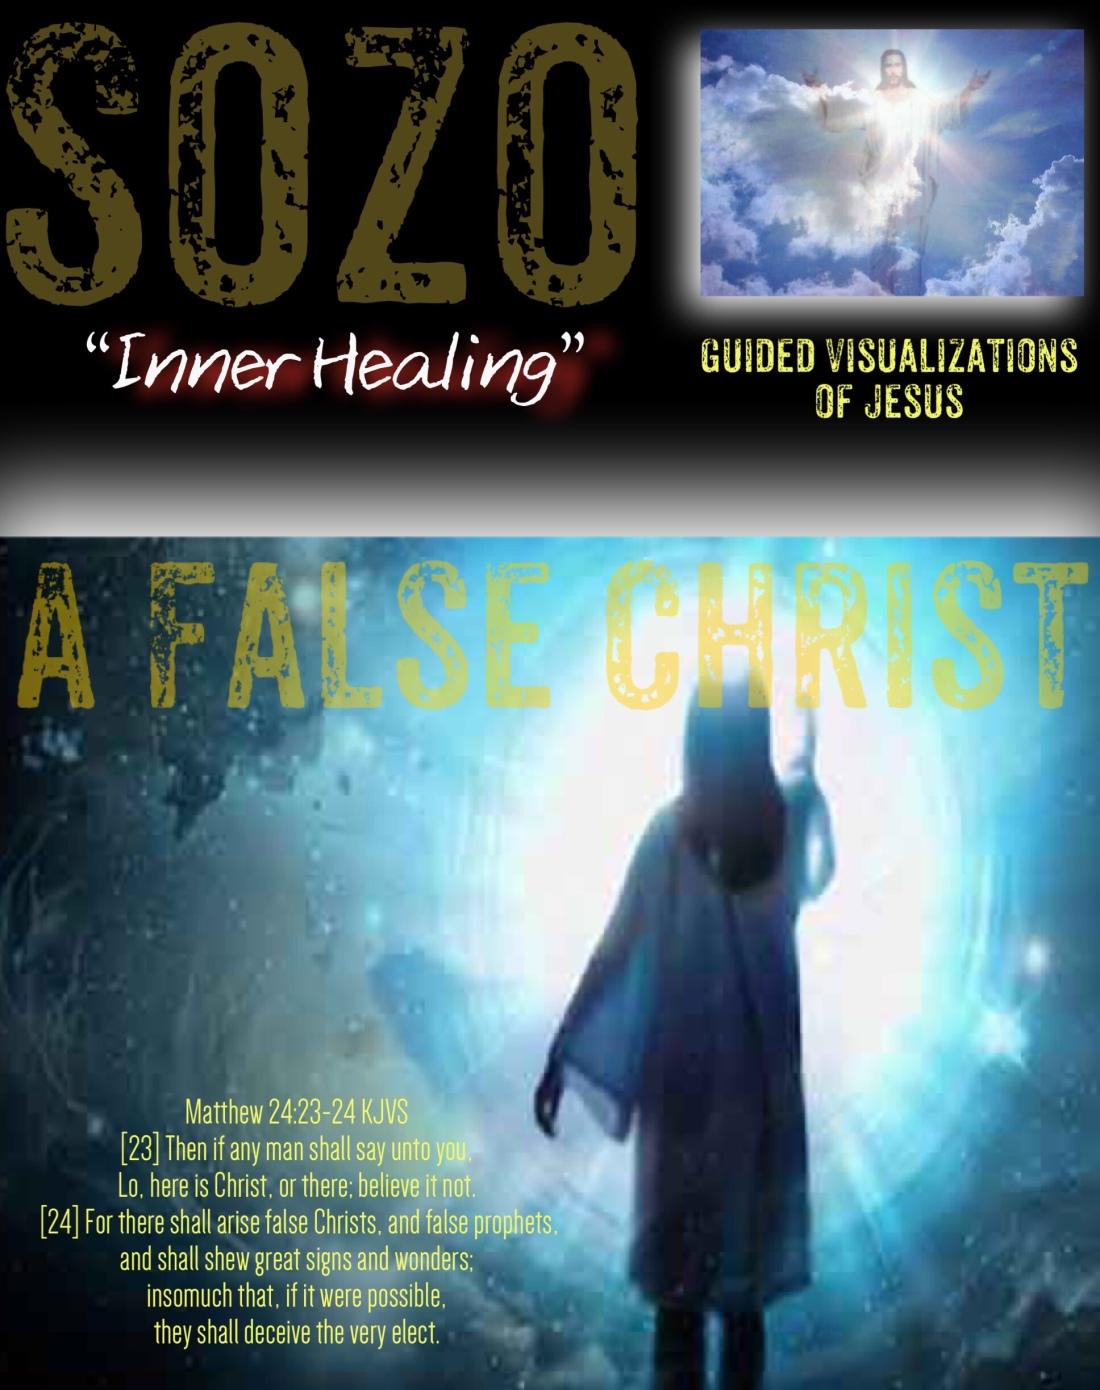 Sozo Inner Healing, In Light of Scripture – Spiritual Realities